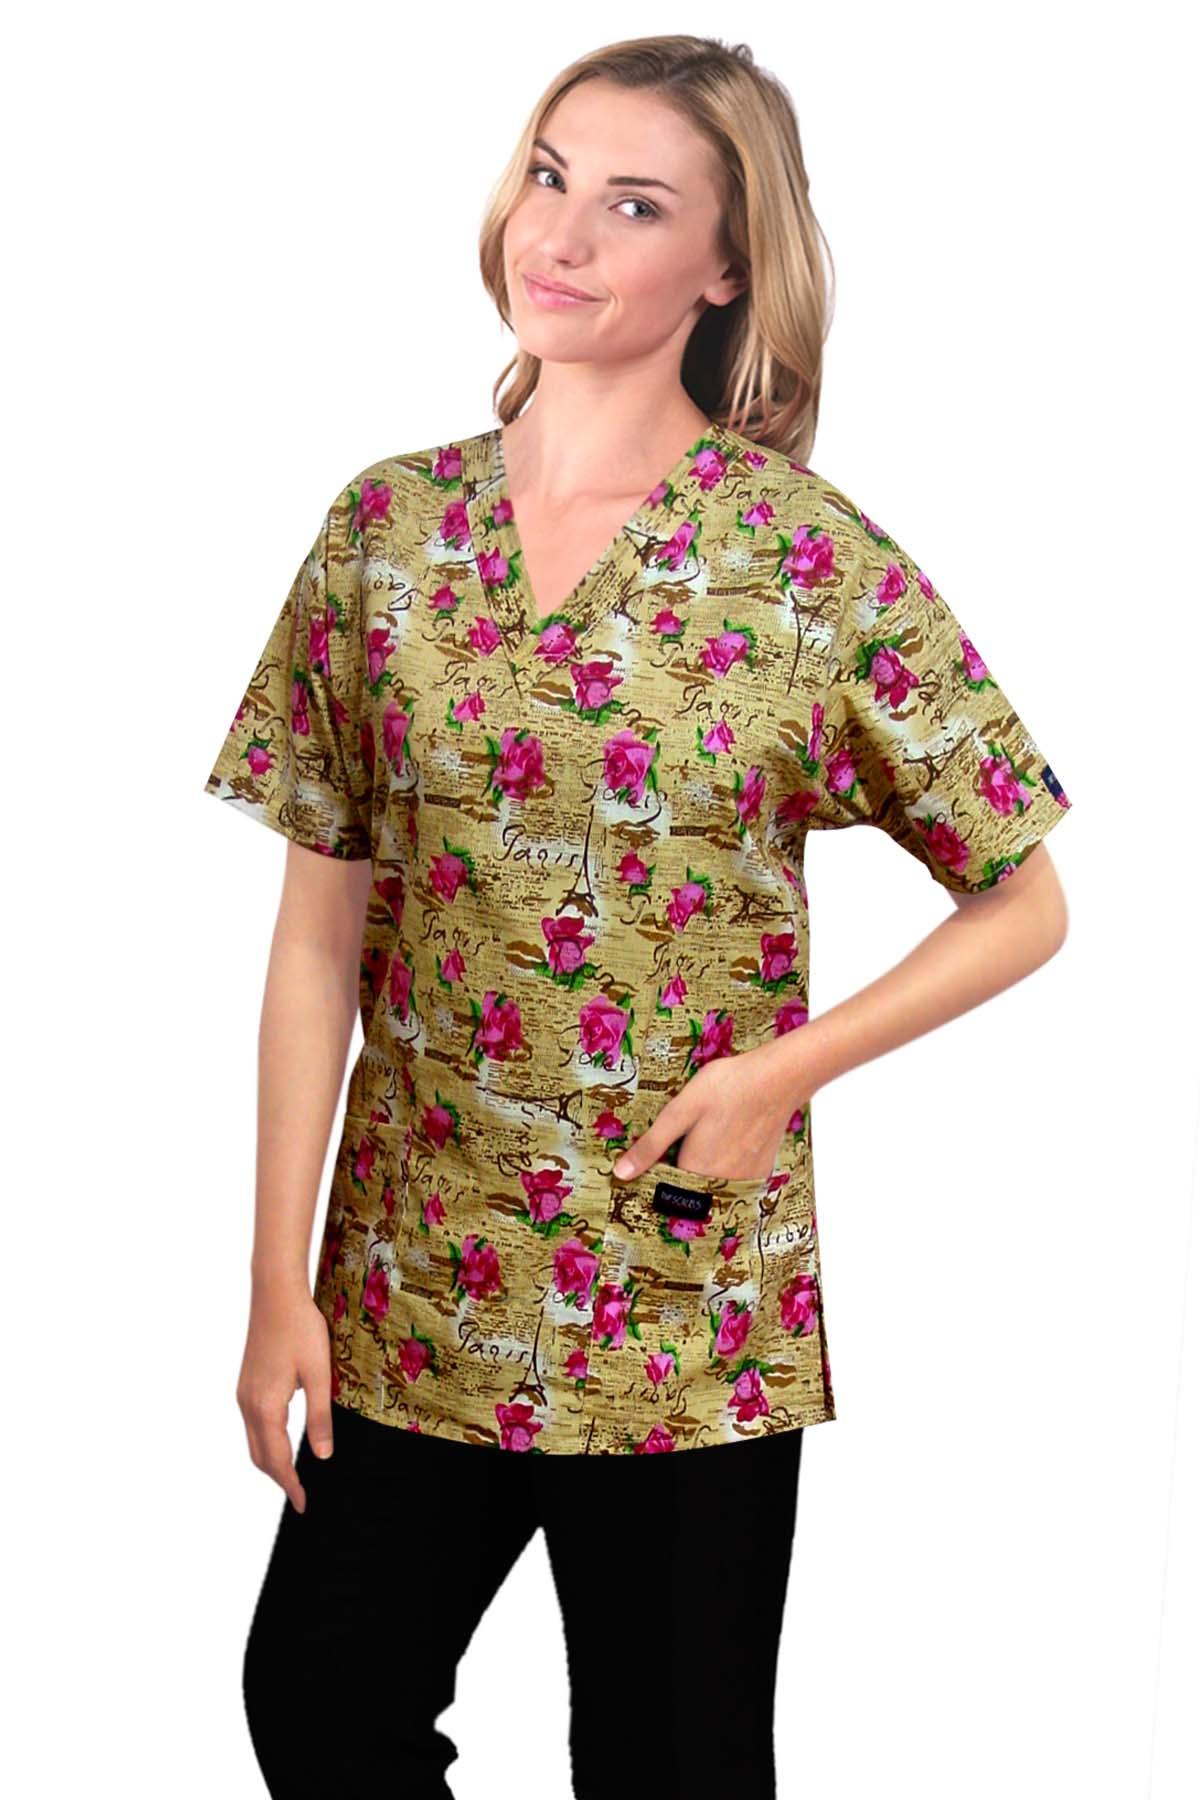 Printed scrub set 4 pocket ladies half sleeve Paris print (2 pocket top and 2 pocket pant)